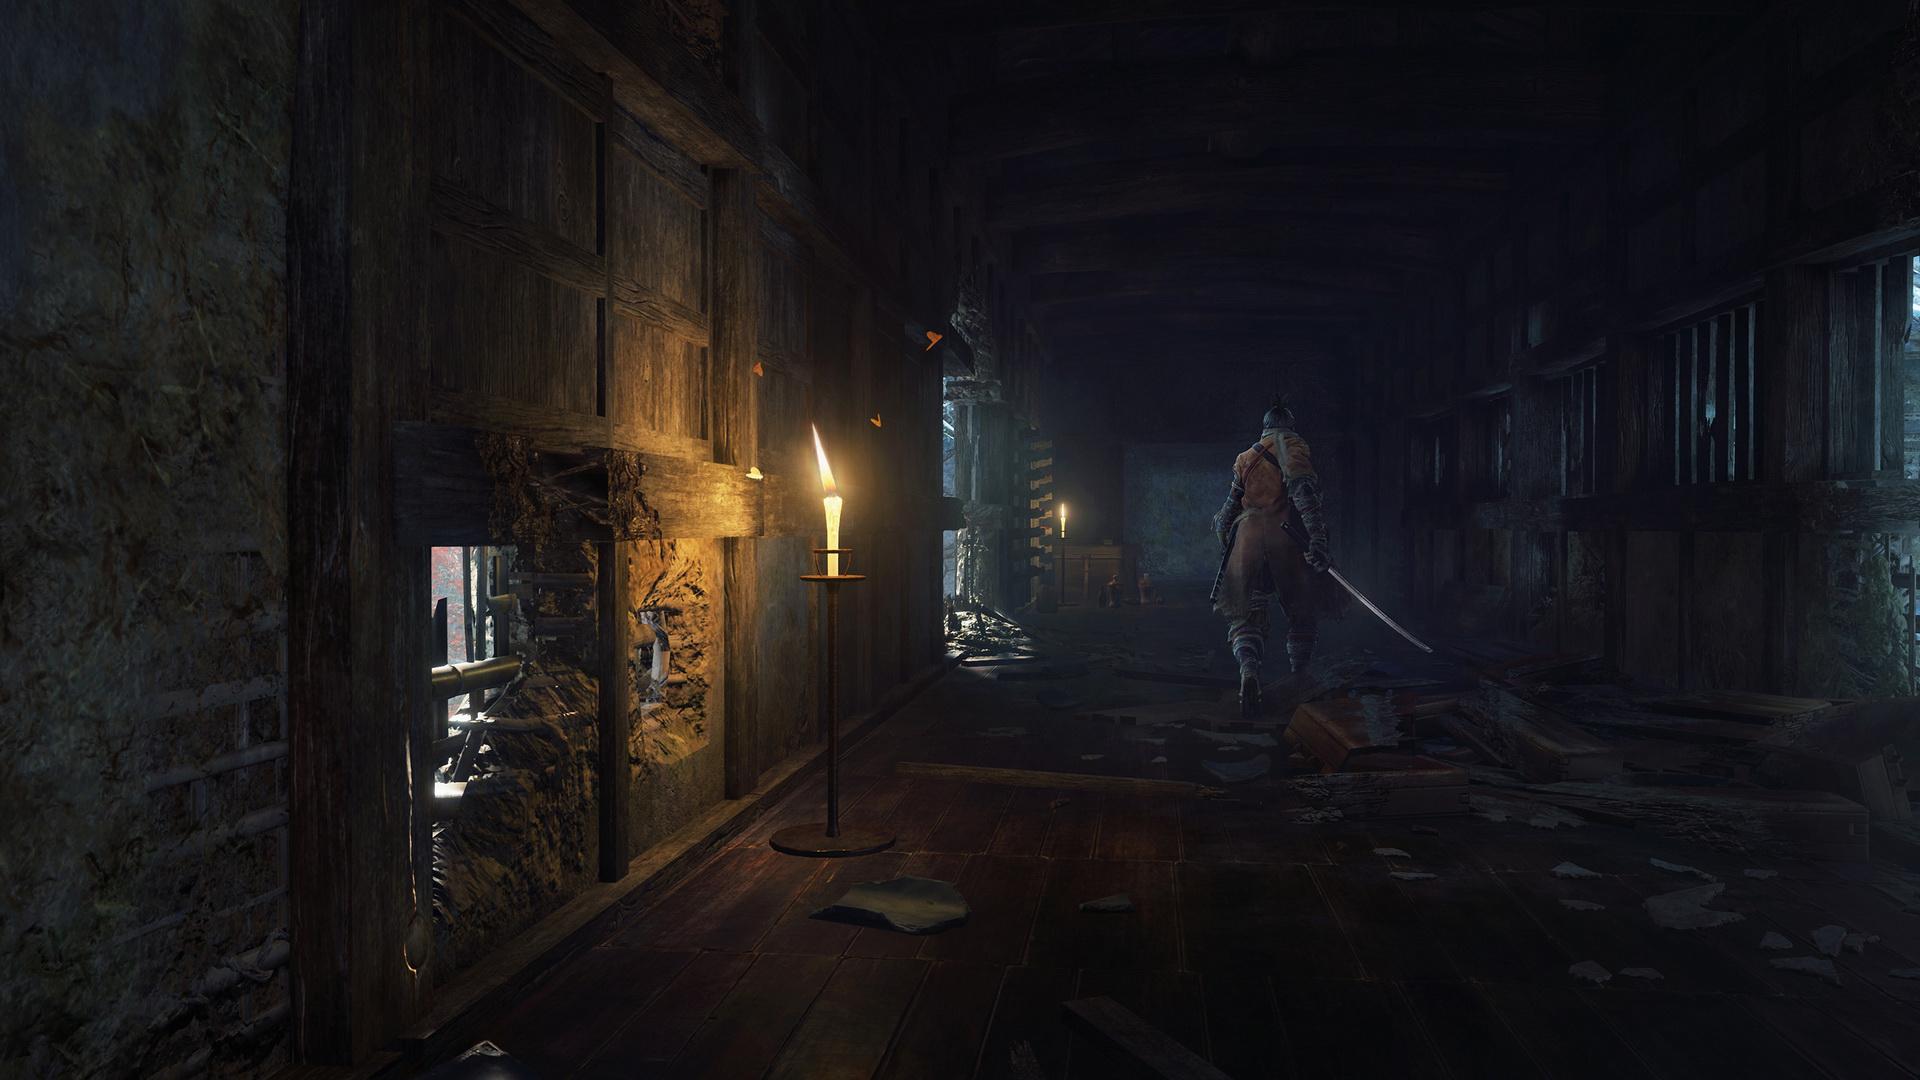 TGS 2018:《只狼:影逝二度》TGS试玩和采访 宫崎英高表示目前没有人能打通试玩